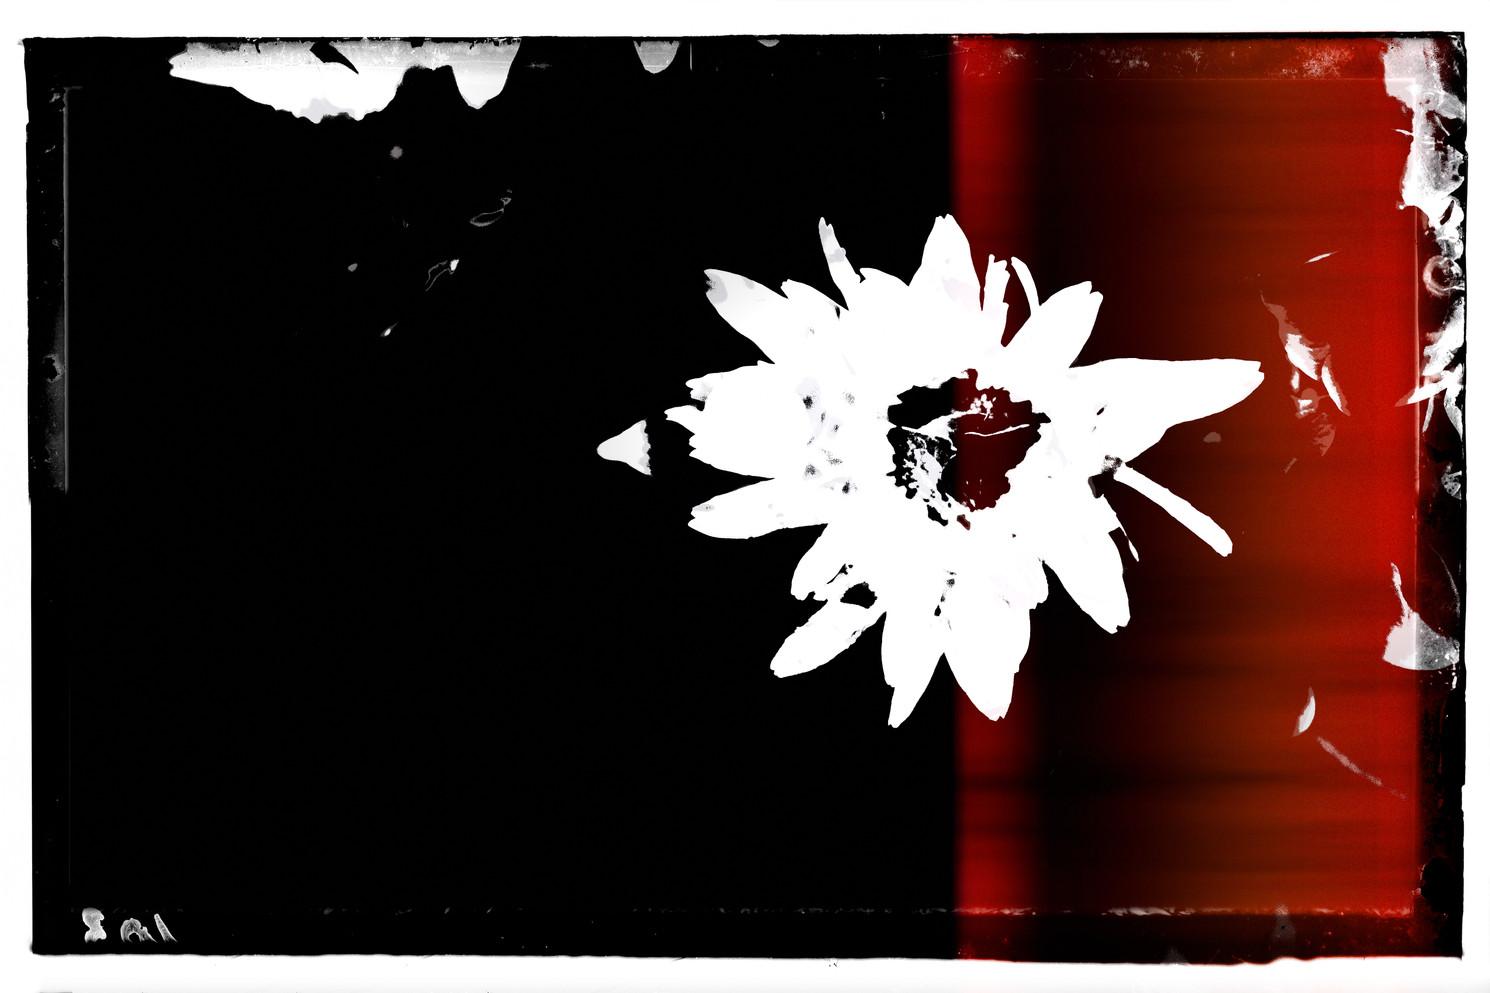 The Garden of Persephone 039